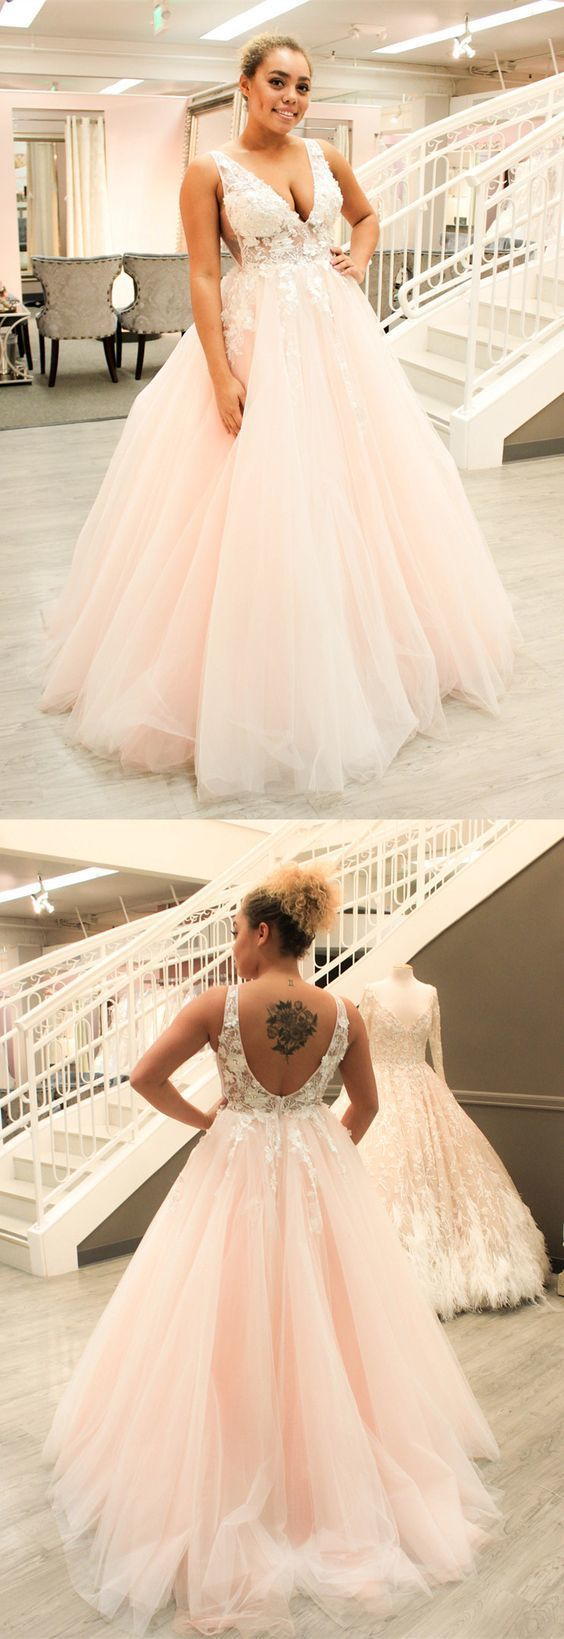 princess long prom dress, 2018 prom dress, pink prom dress, v neck prom dress,